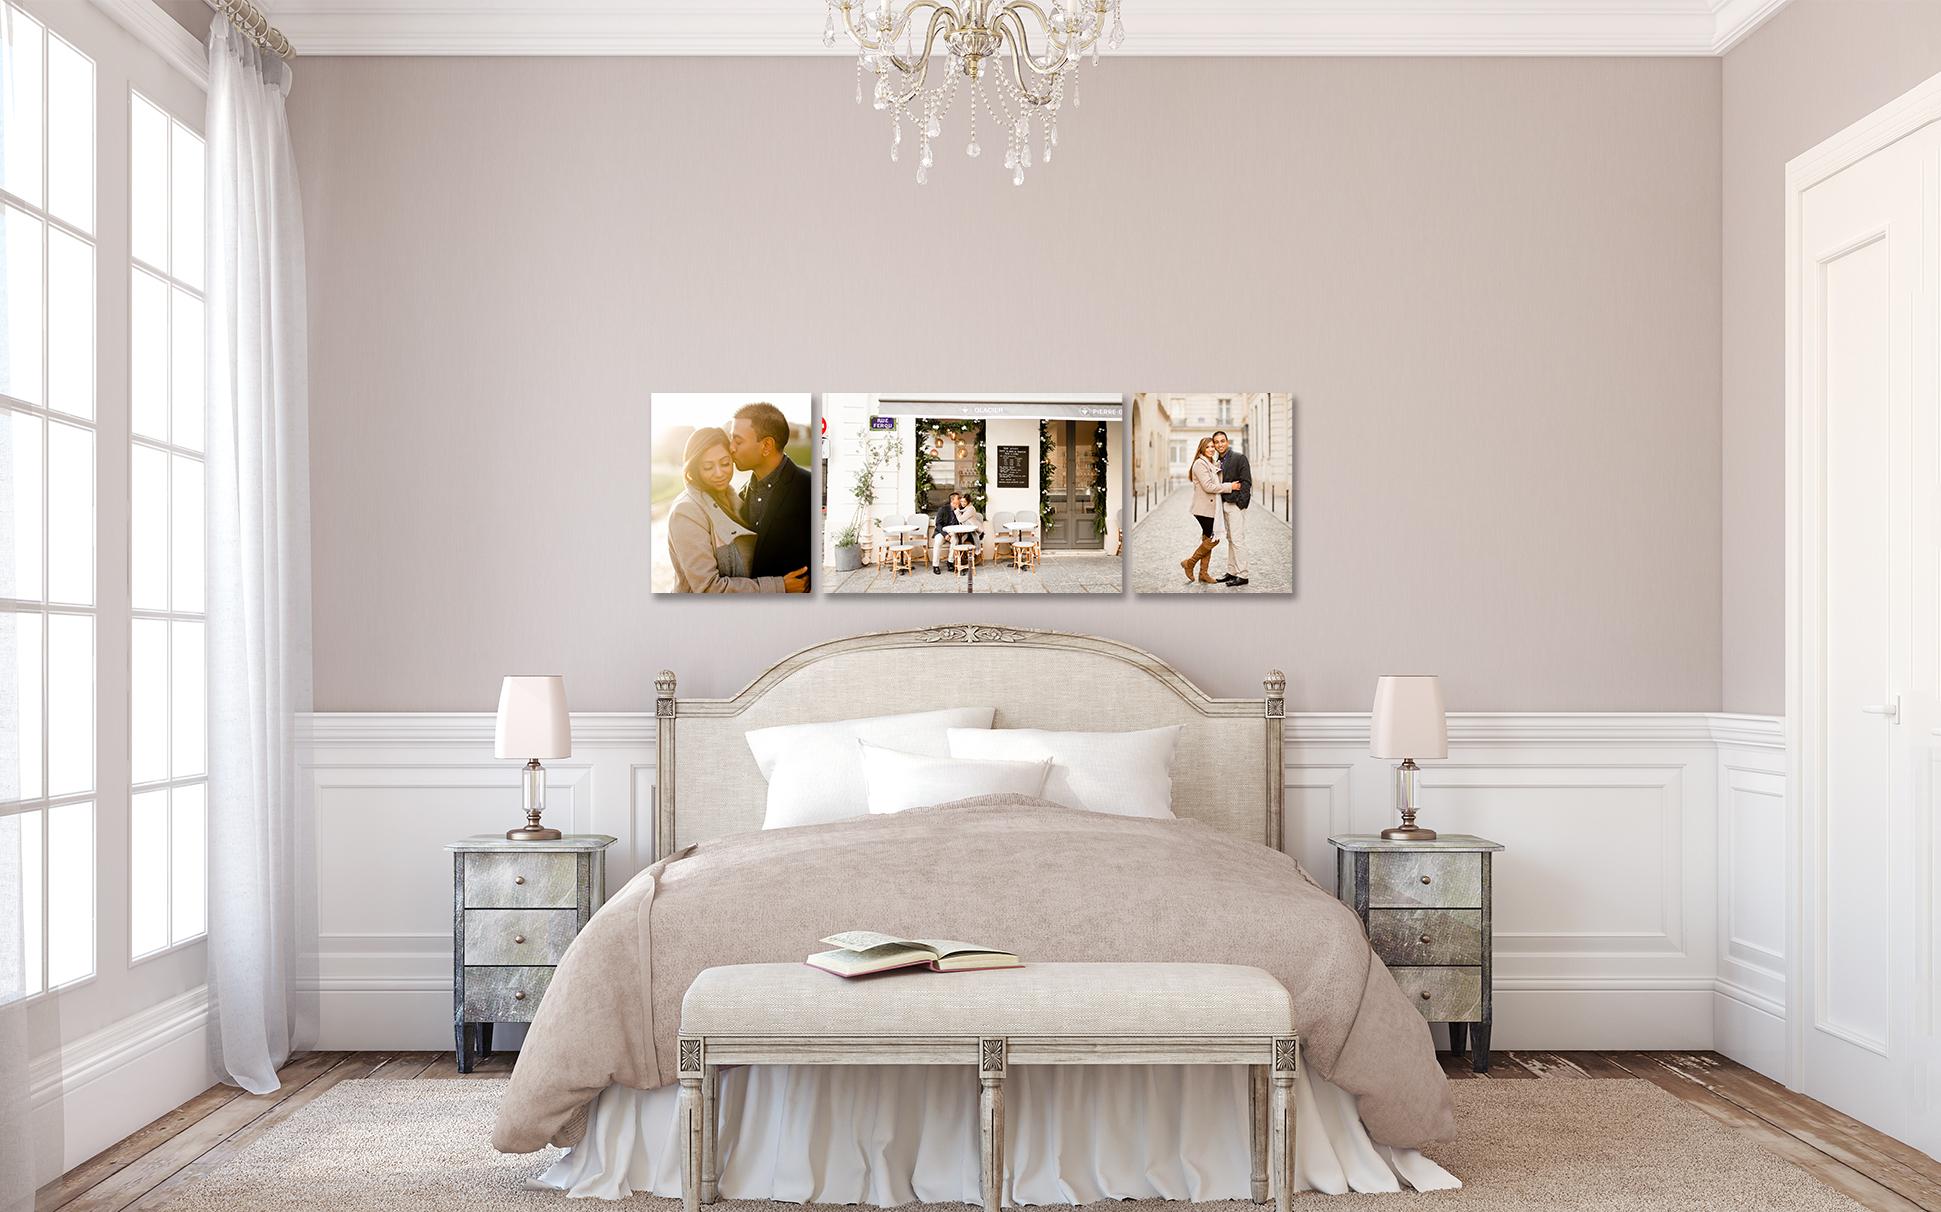 wall-portrait-collection-inspiration-paris-photographer-katie-donnelly.jpg